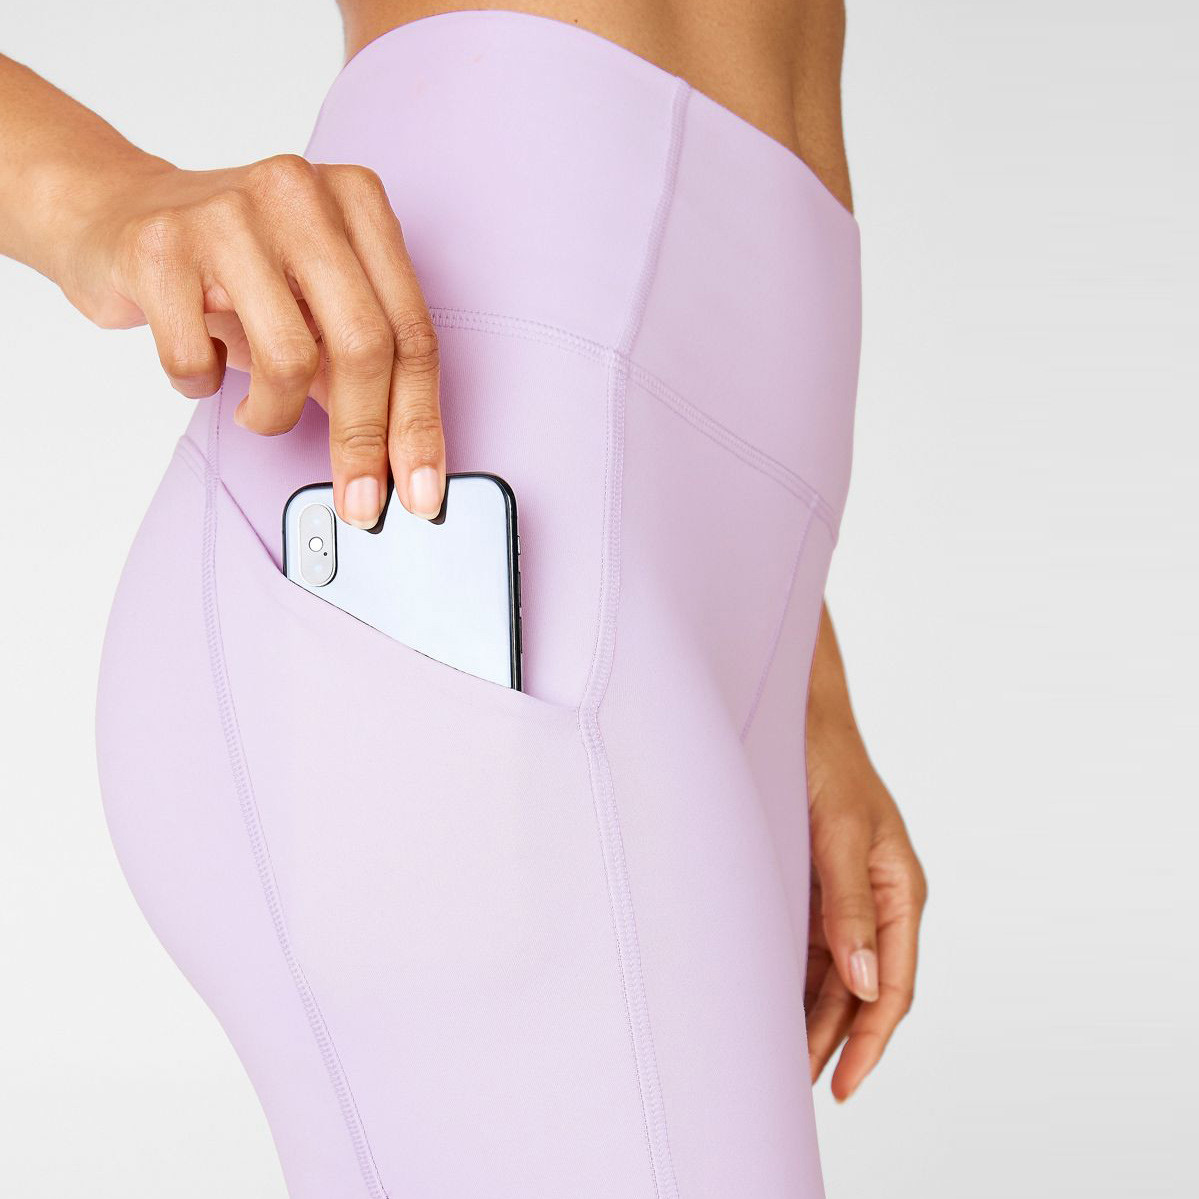 custom leggings manufacturer